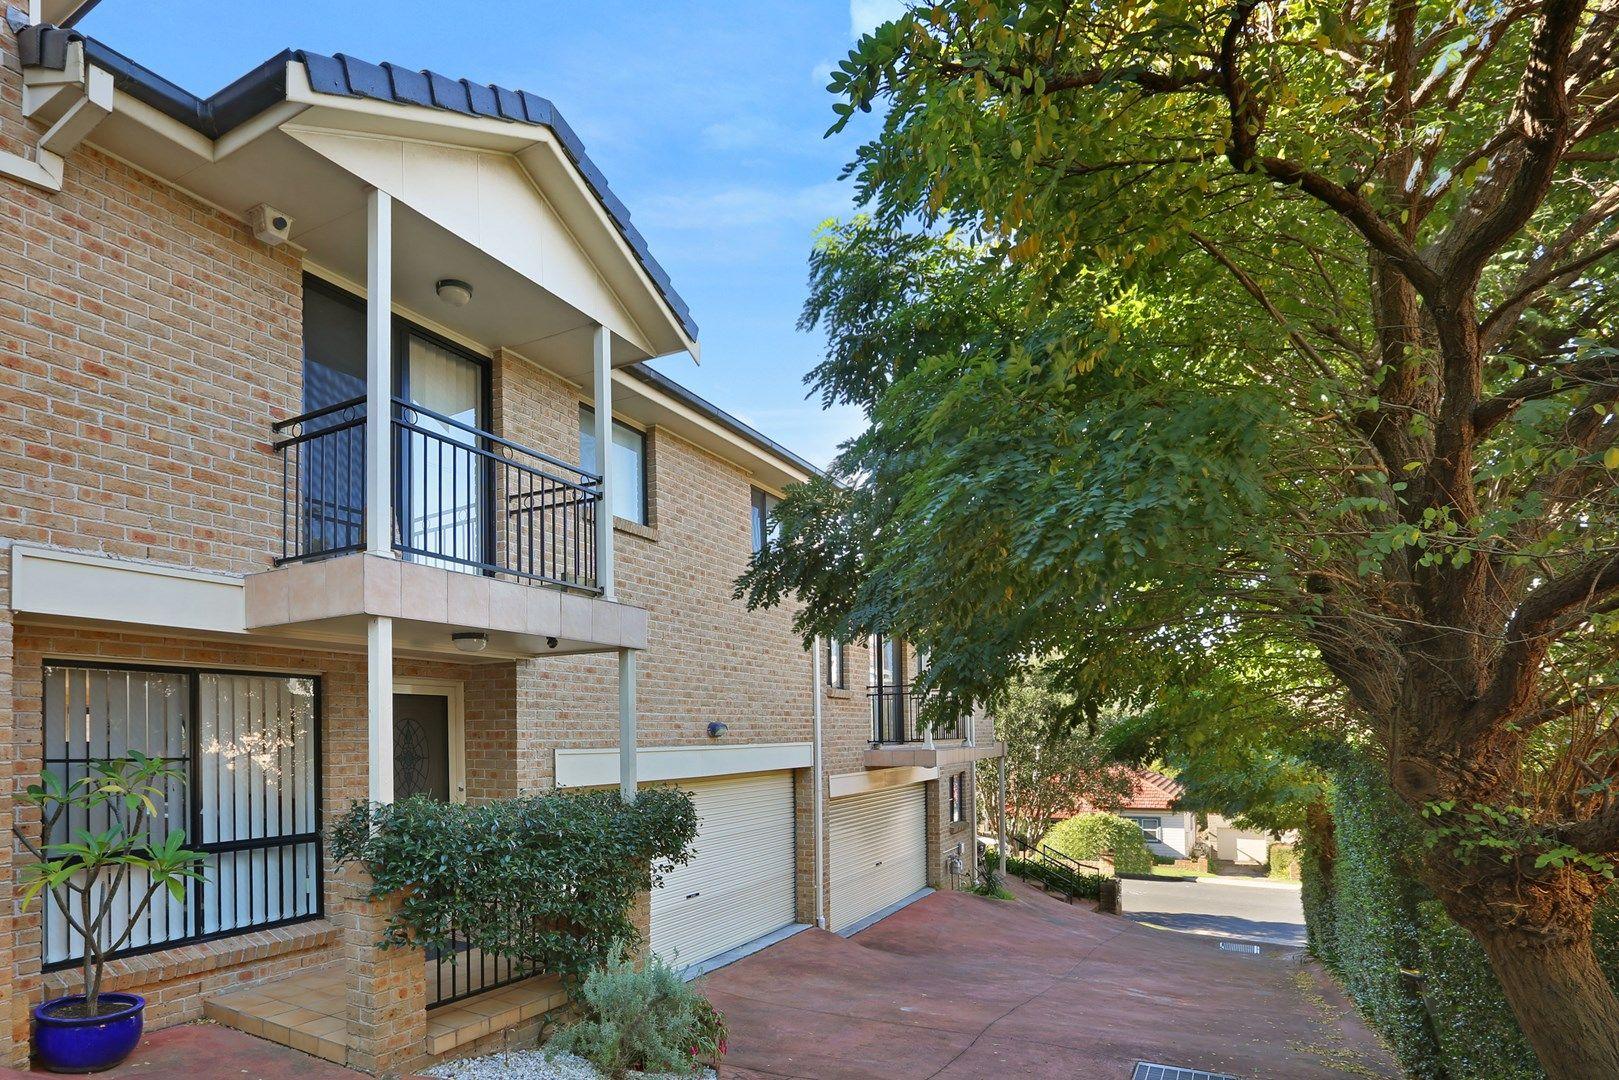 2/22 Matthews Street, Wollongong NSW 2500, Image 0